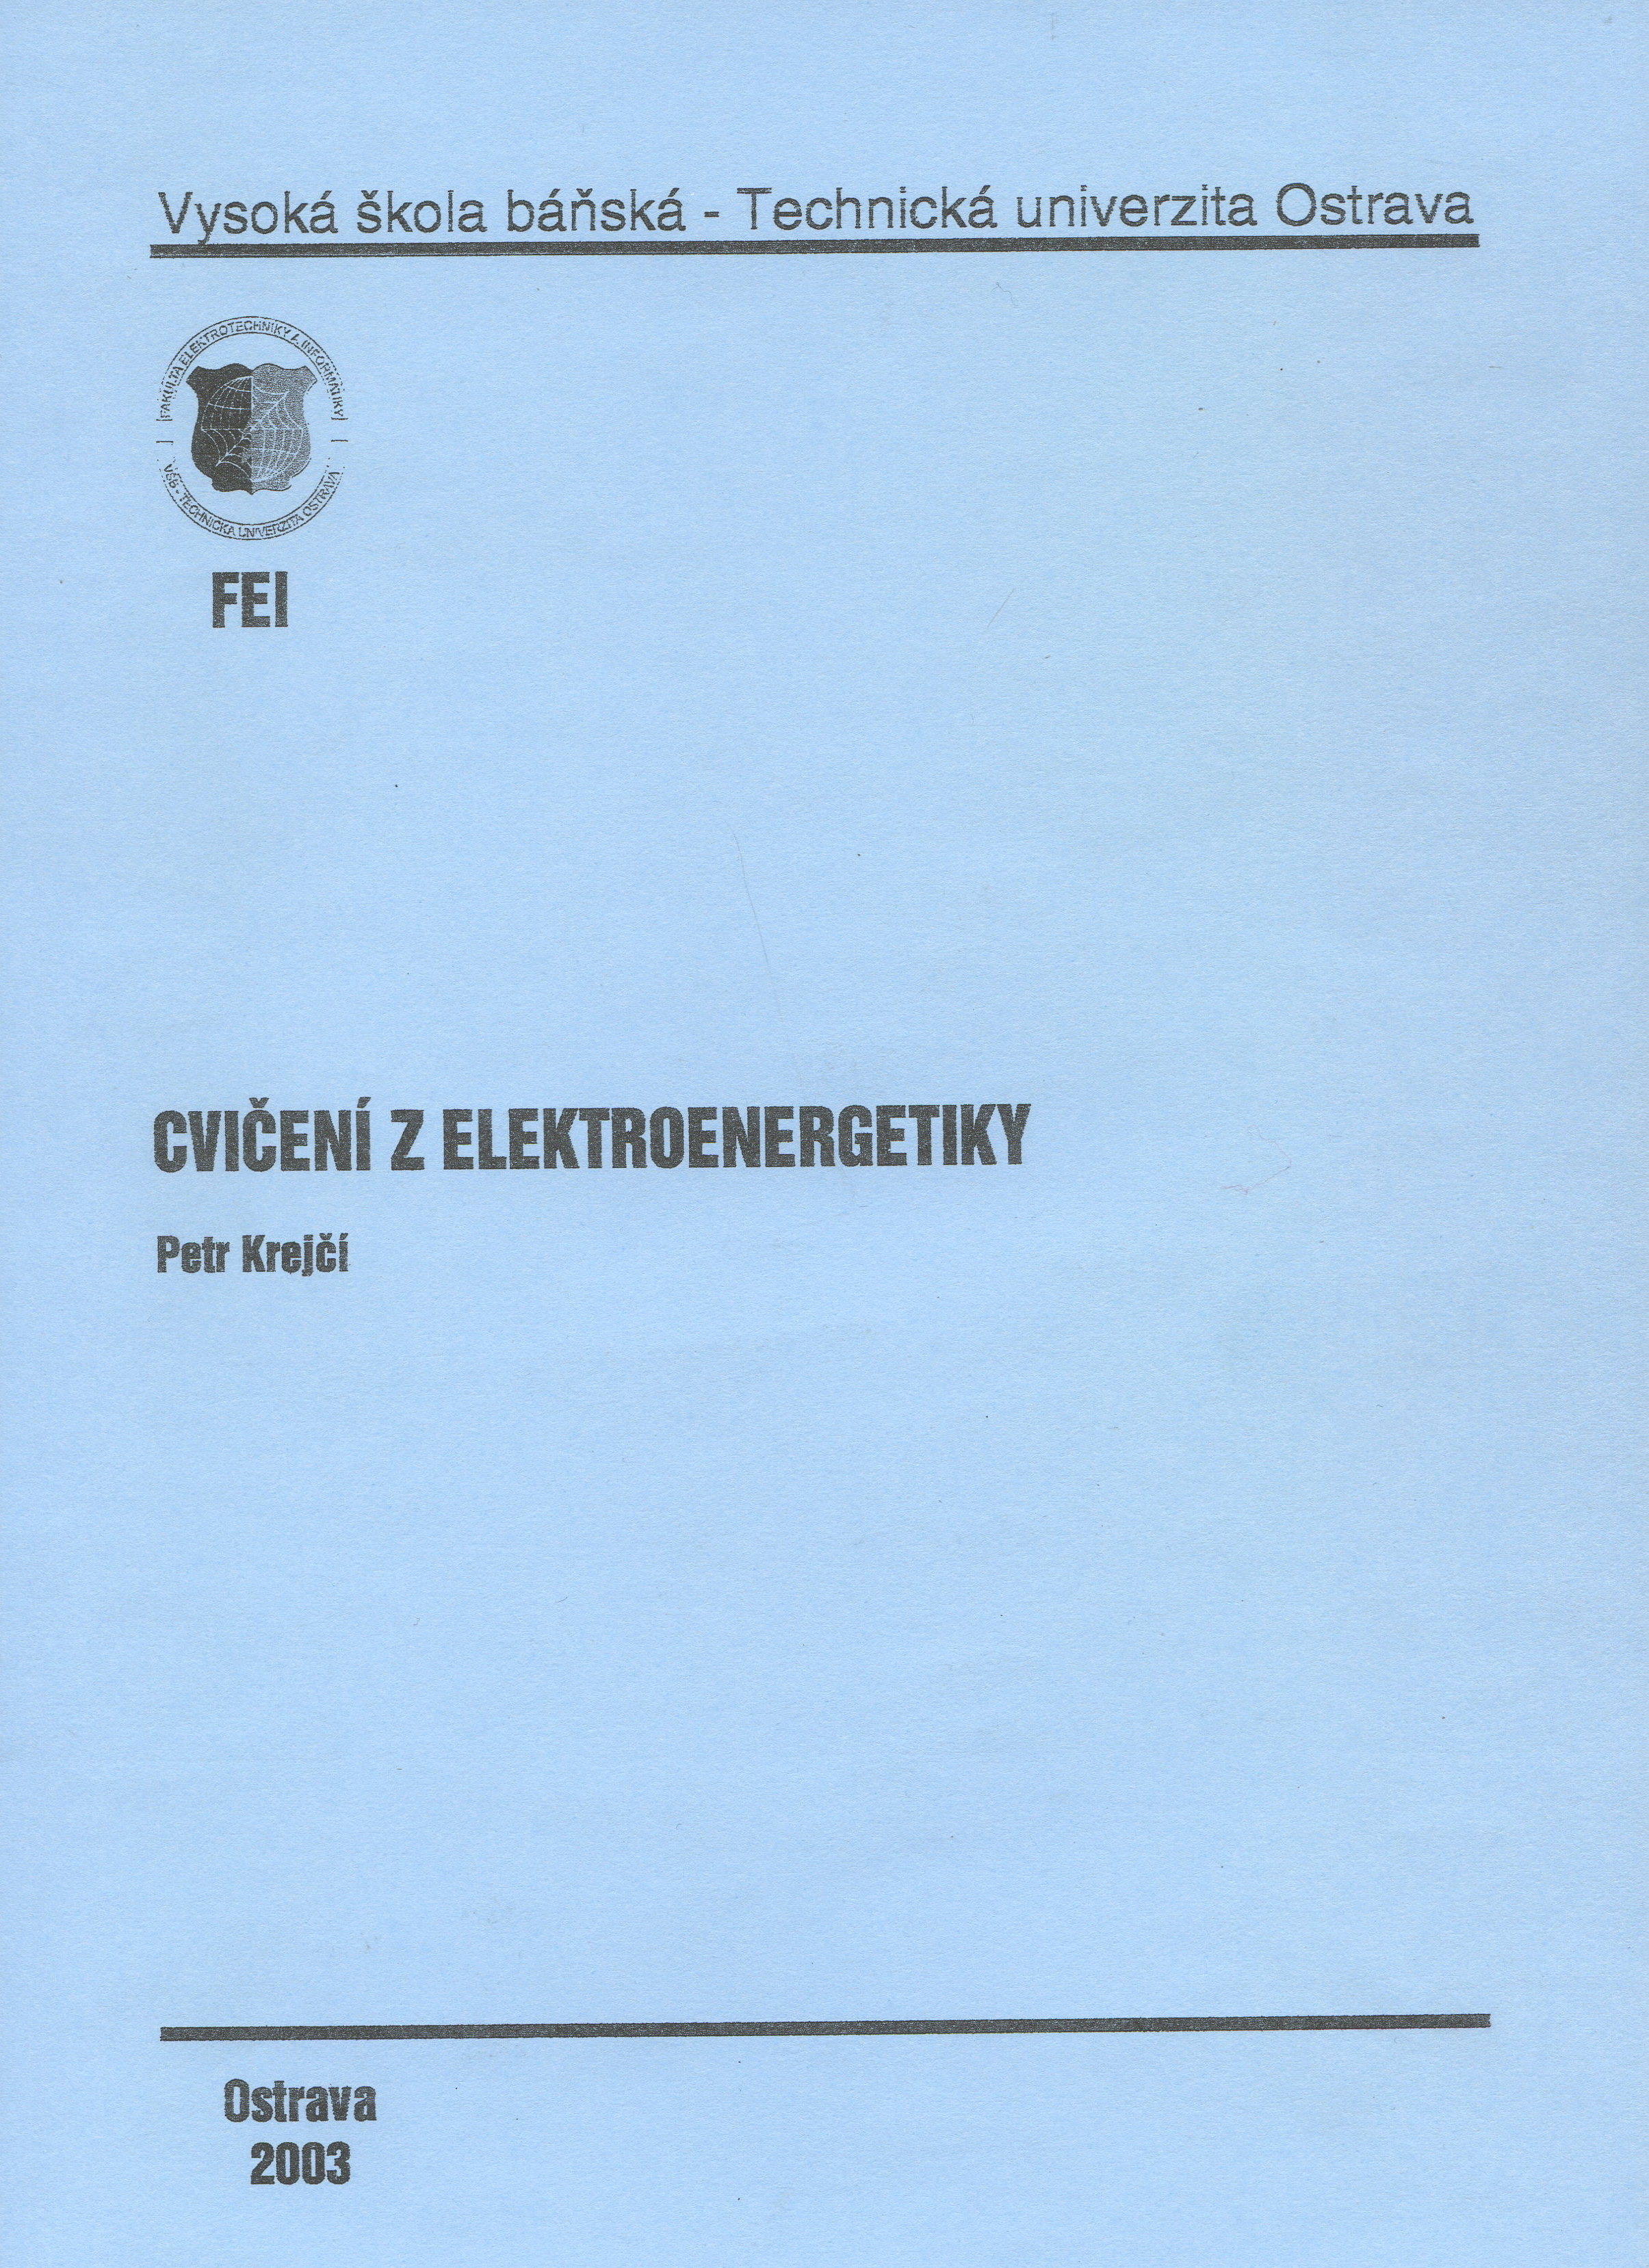 Cvičení z elektroenergetiky